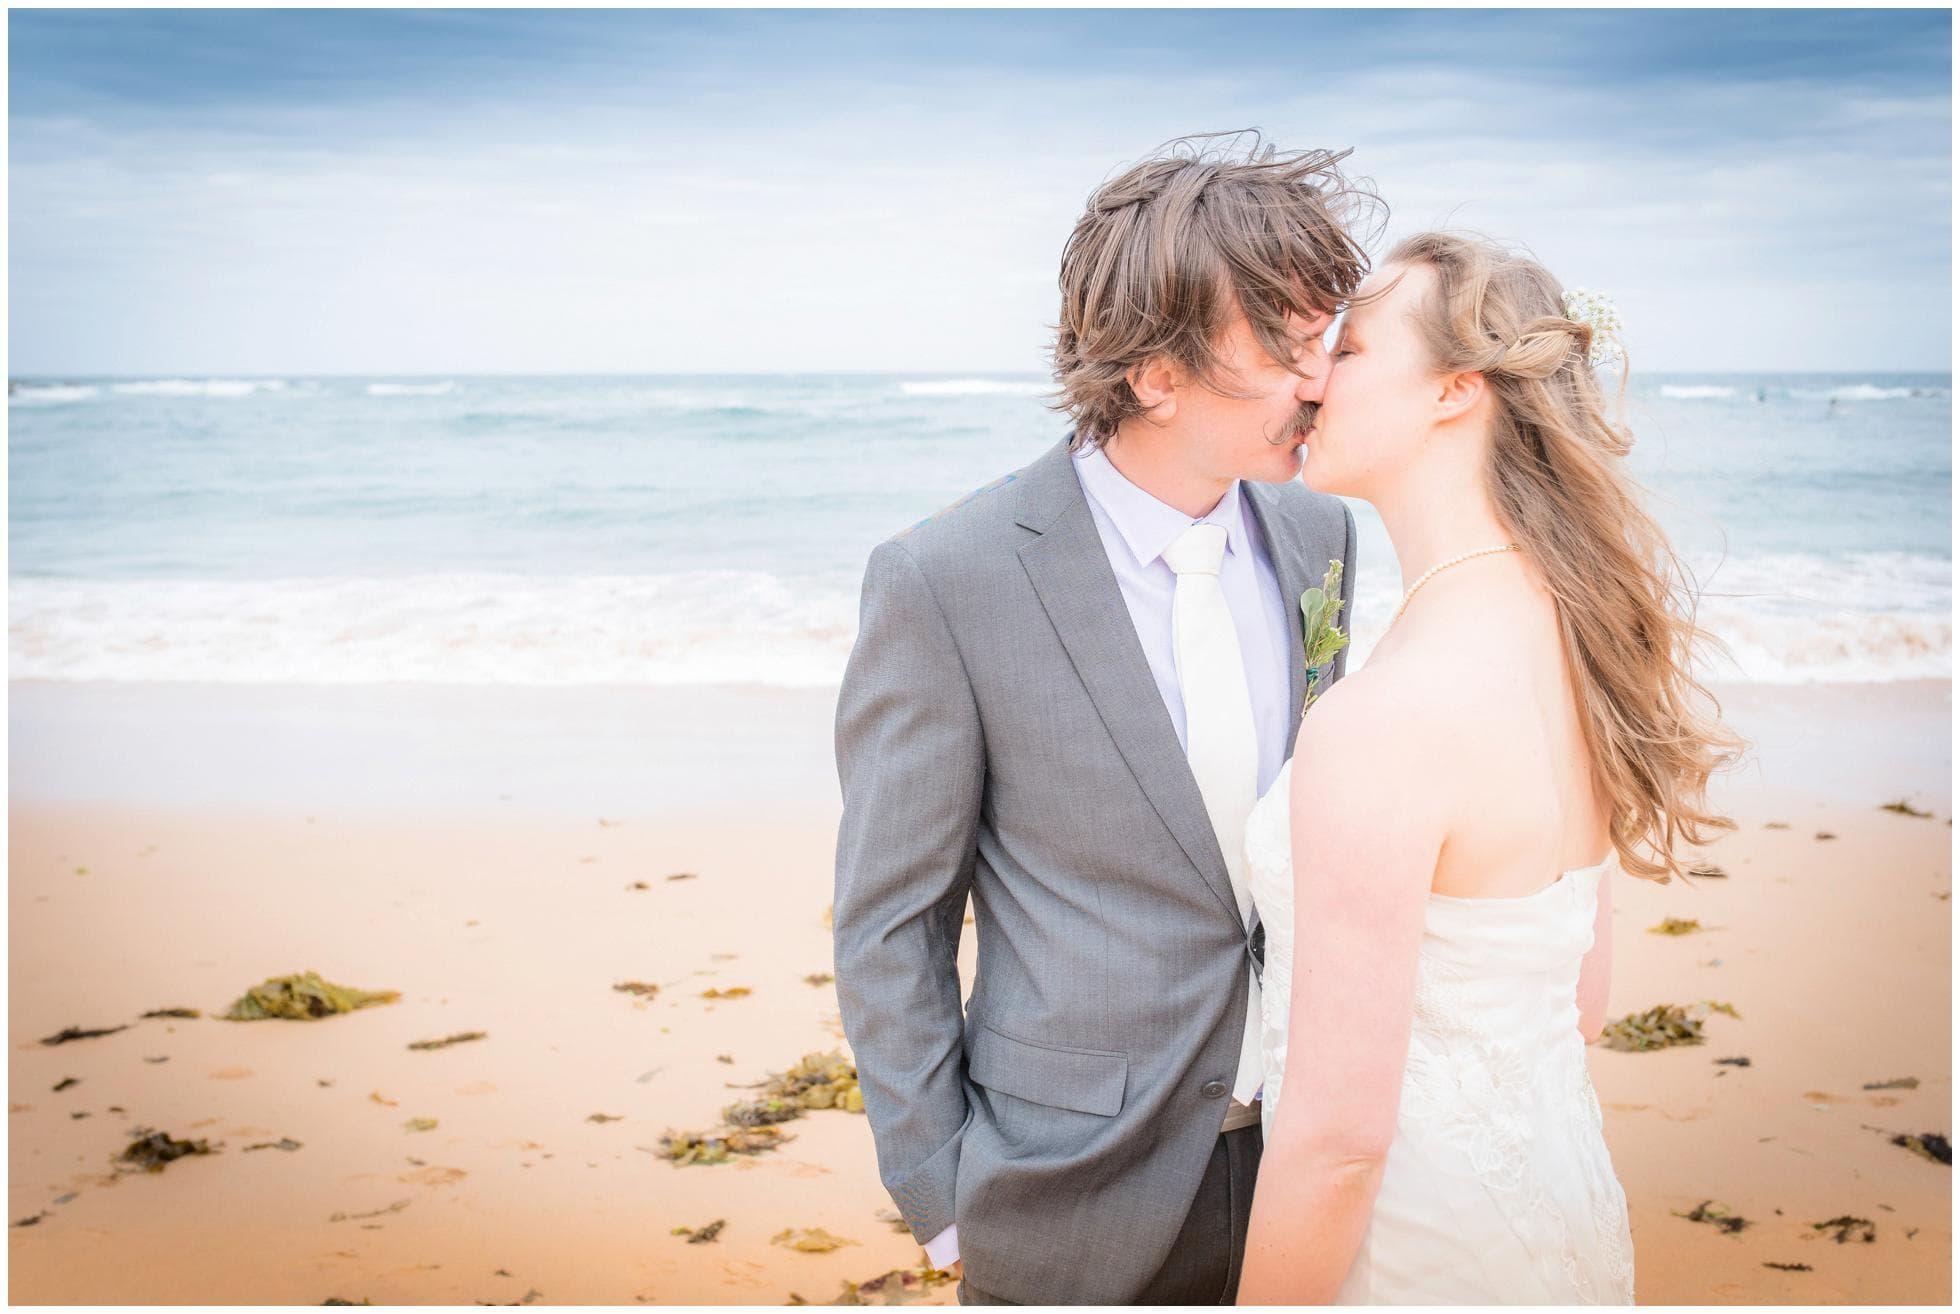 Bride and Groom kssing on the Mona Vale beach - a Sydney wedding photographer's dream wedding